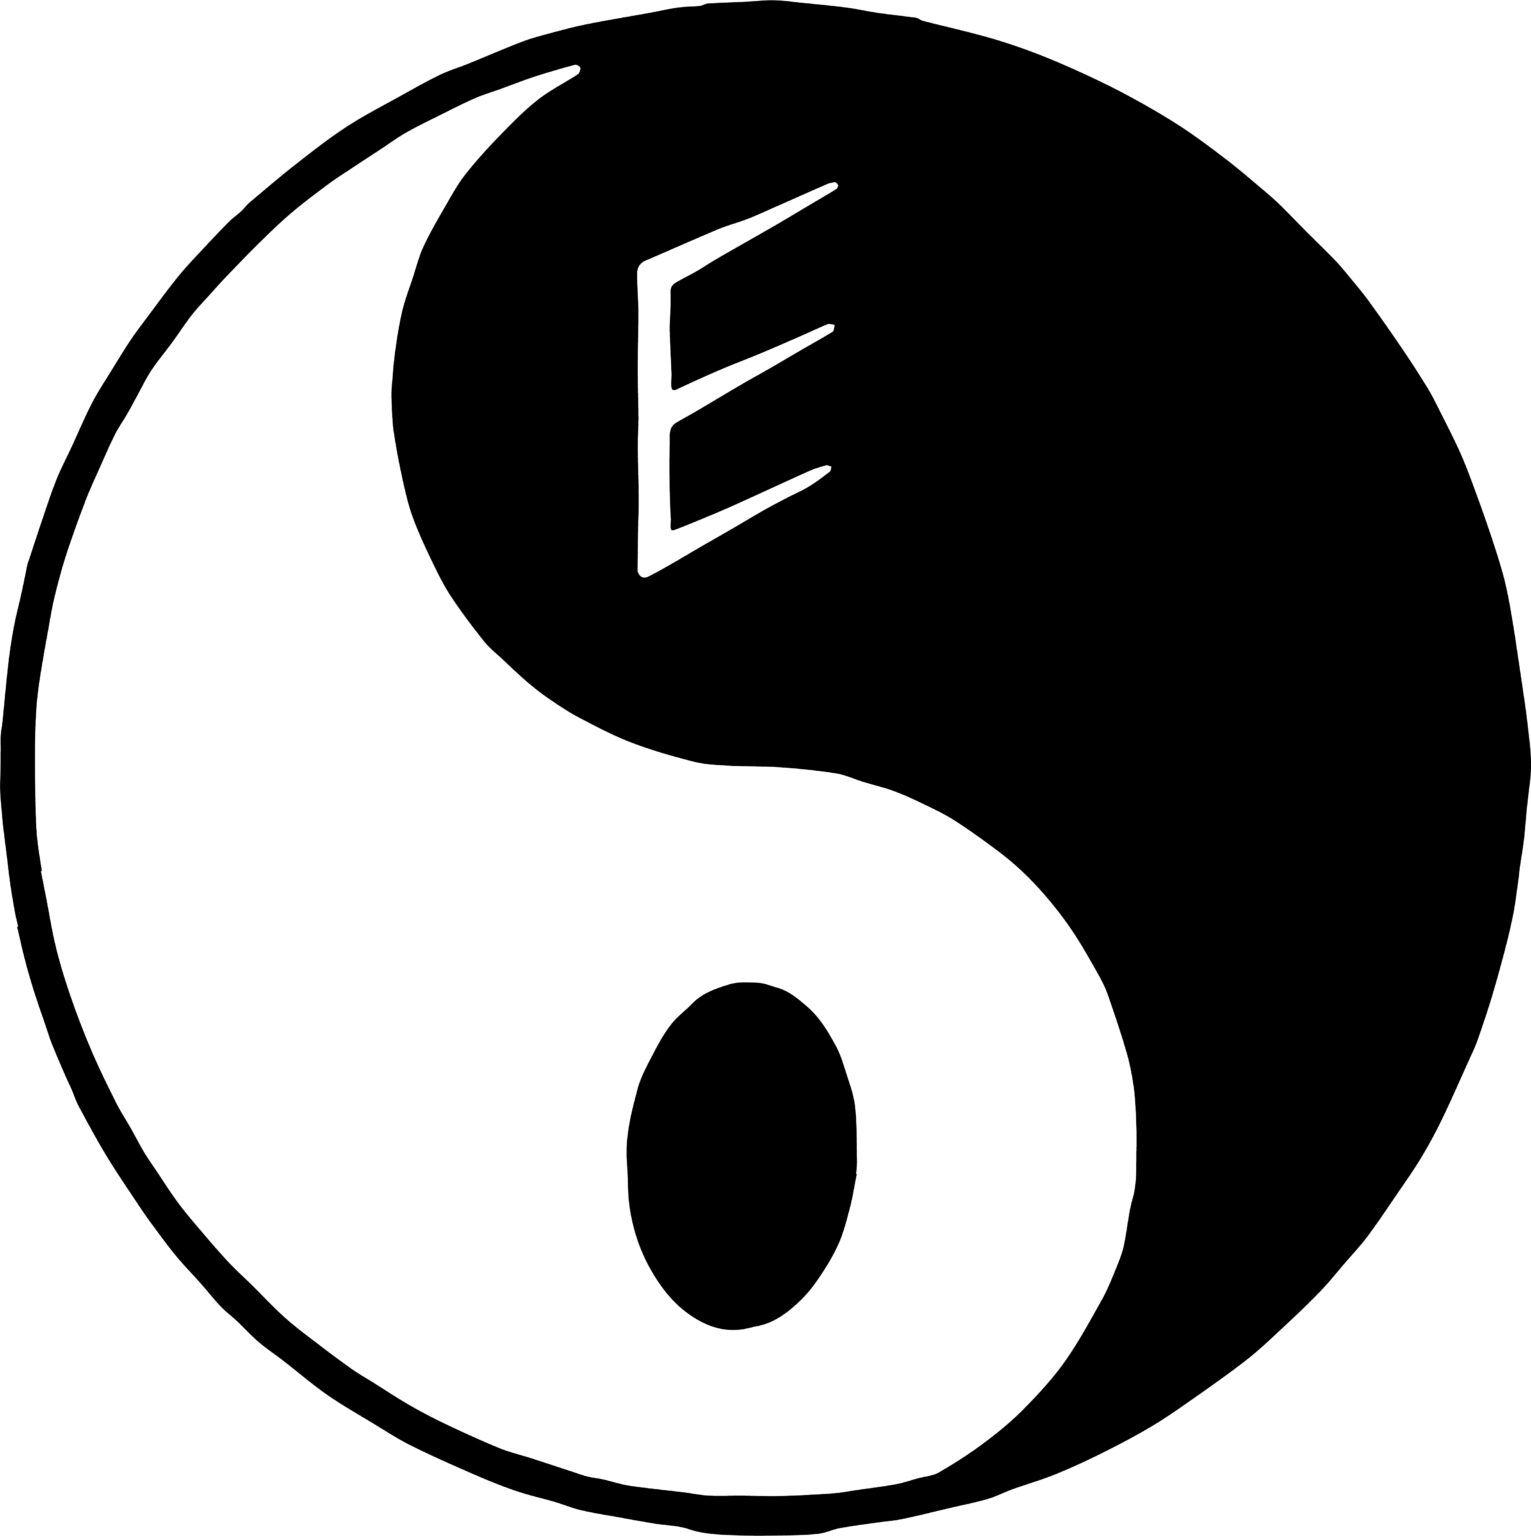 eso_logo